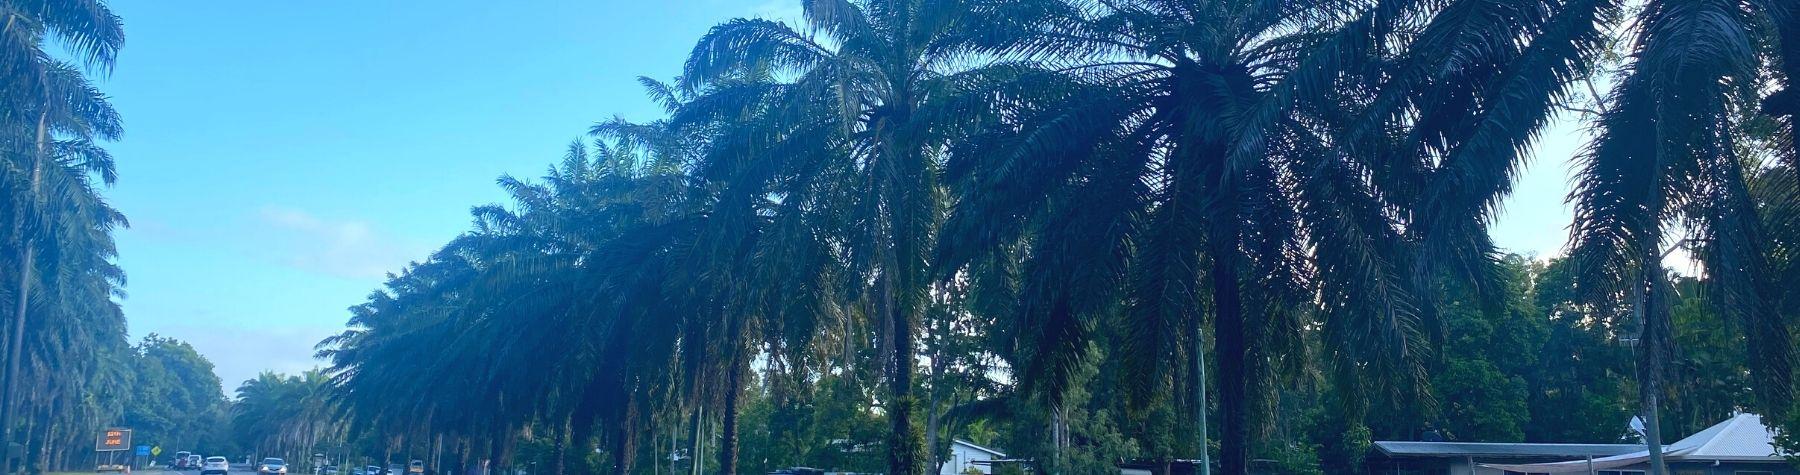 Plan for multi-million-dollar avenue of palms